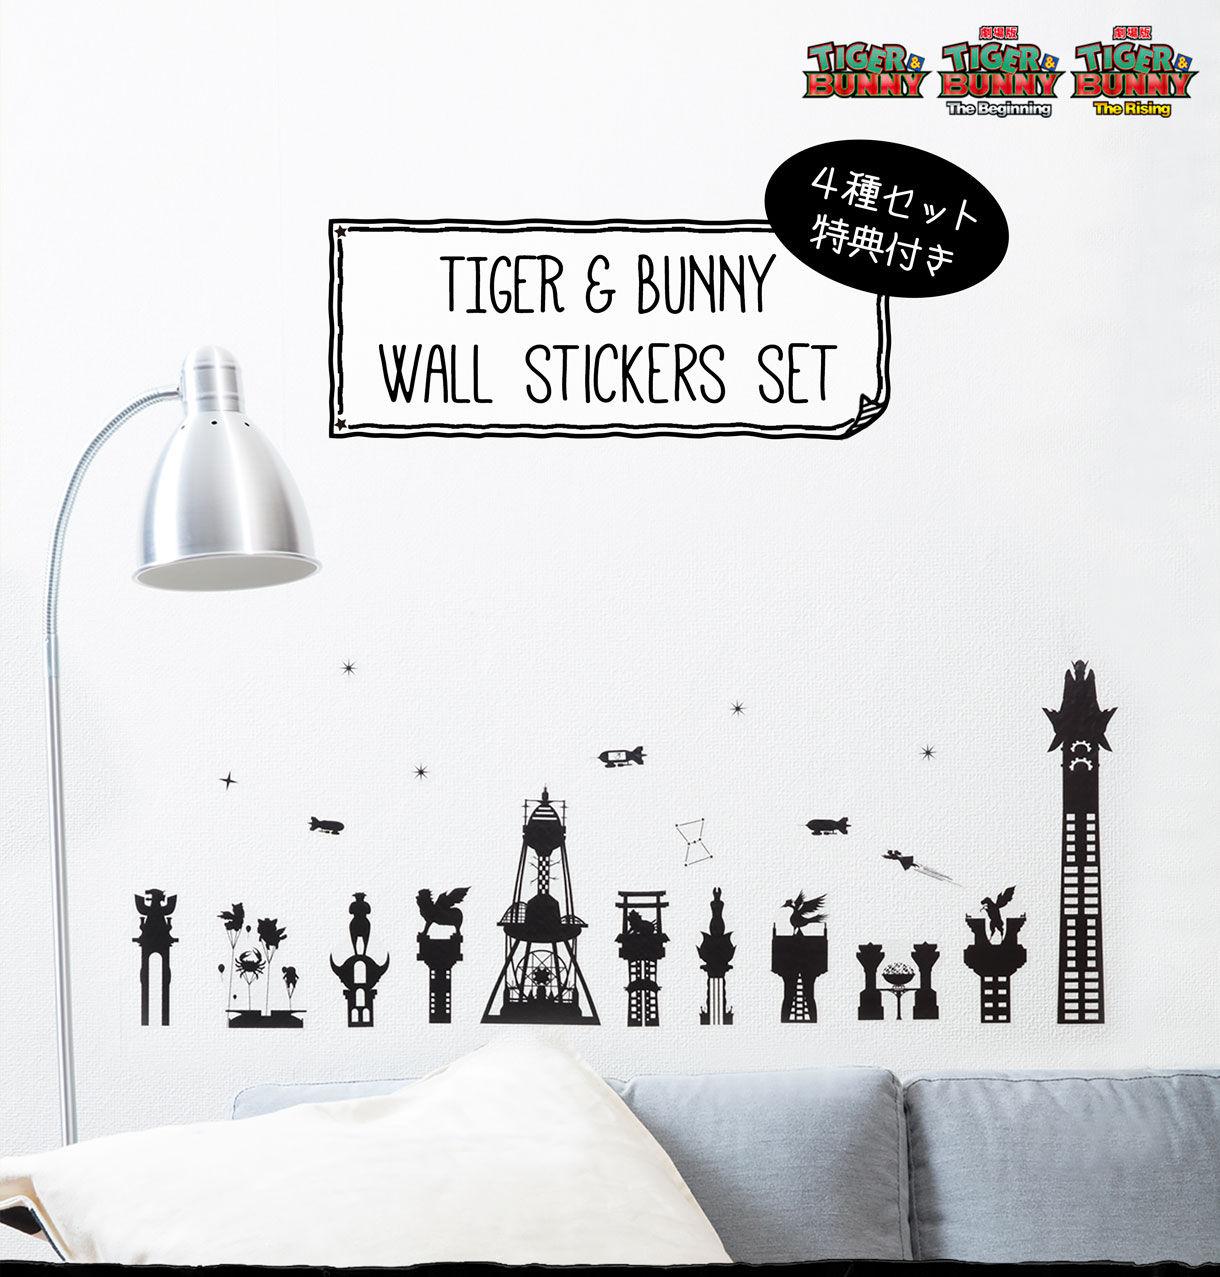 TIGER & BUNNY ウォールステッカー4種セット【特典付】【PB限定】